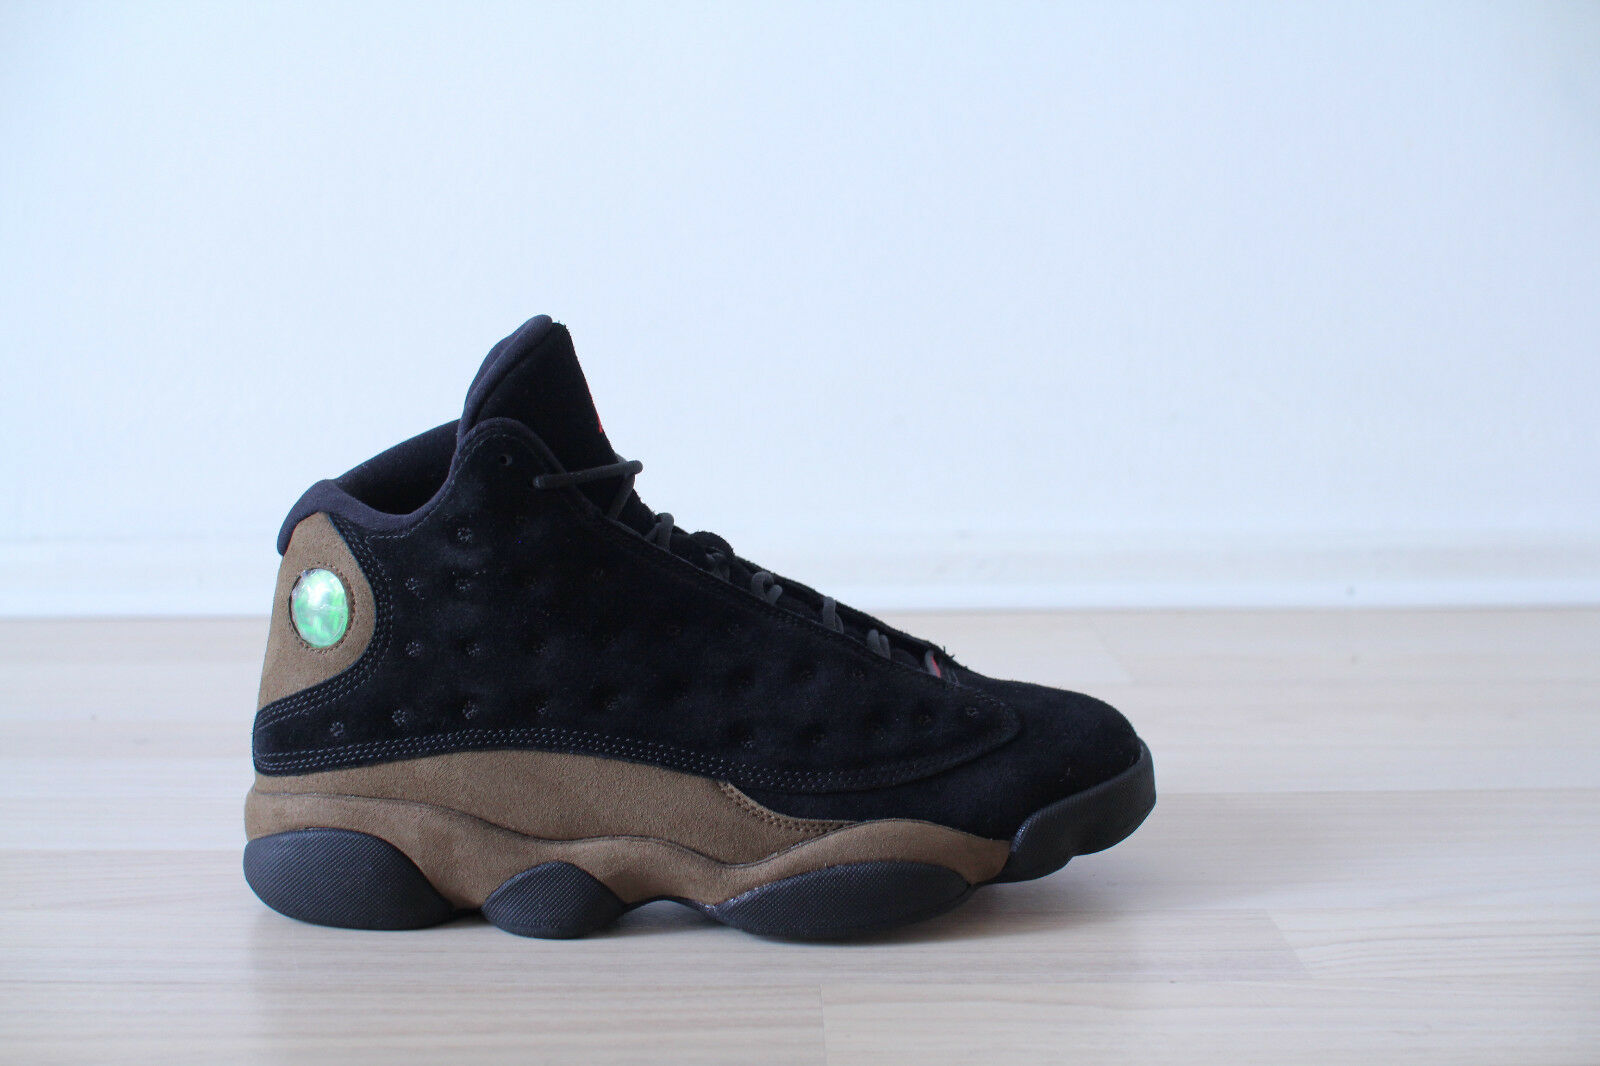 low priced 52a84 502b6 Nike Air Jordan 13 13 13 Retro black Olive Gr. 42,43,44